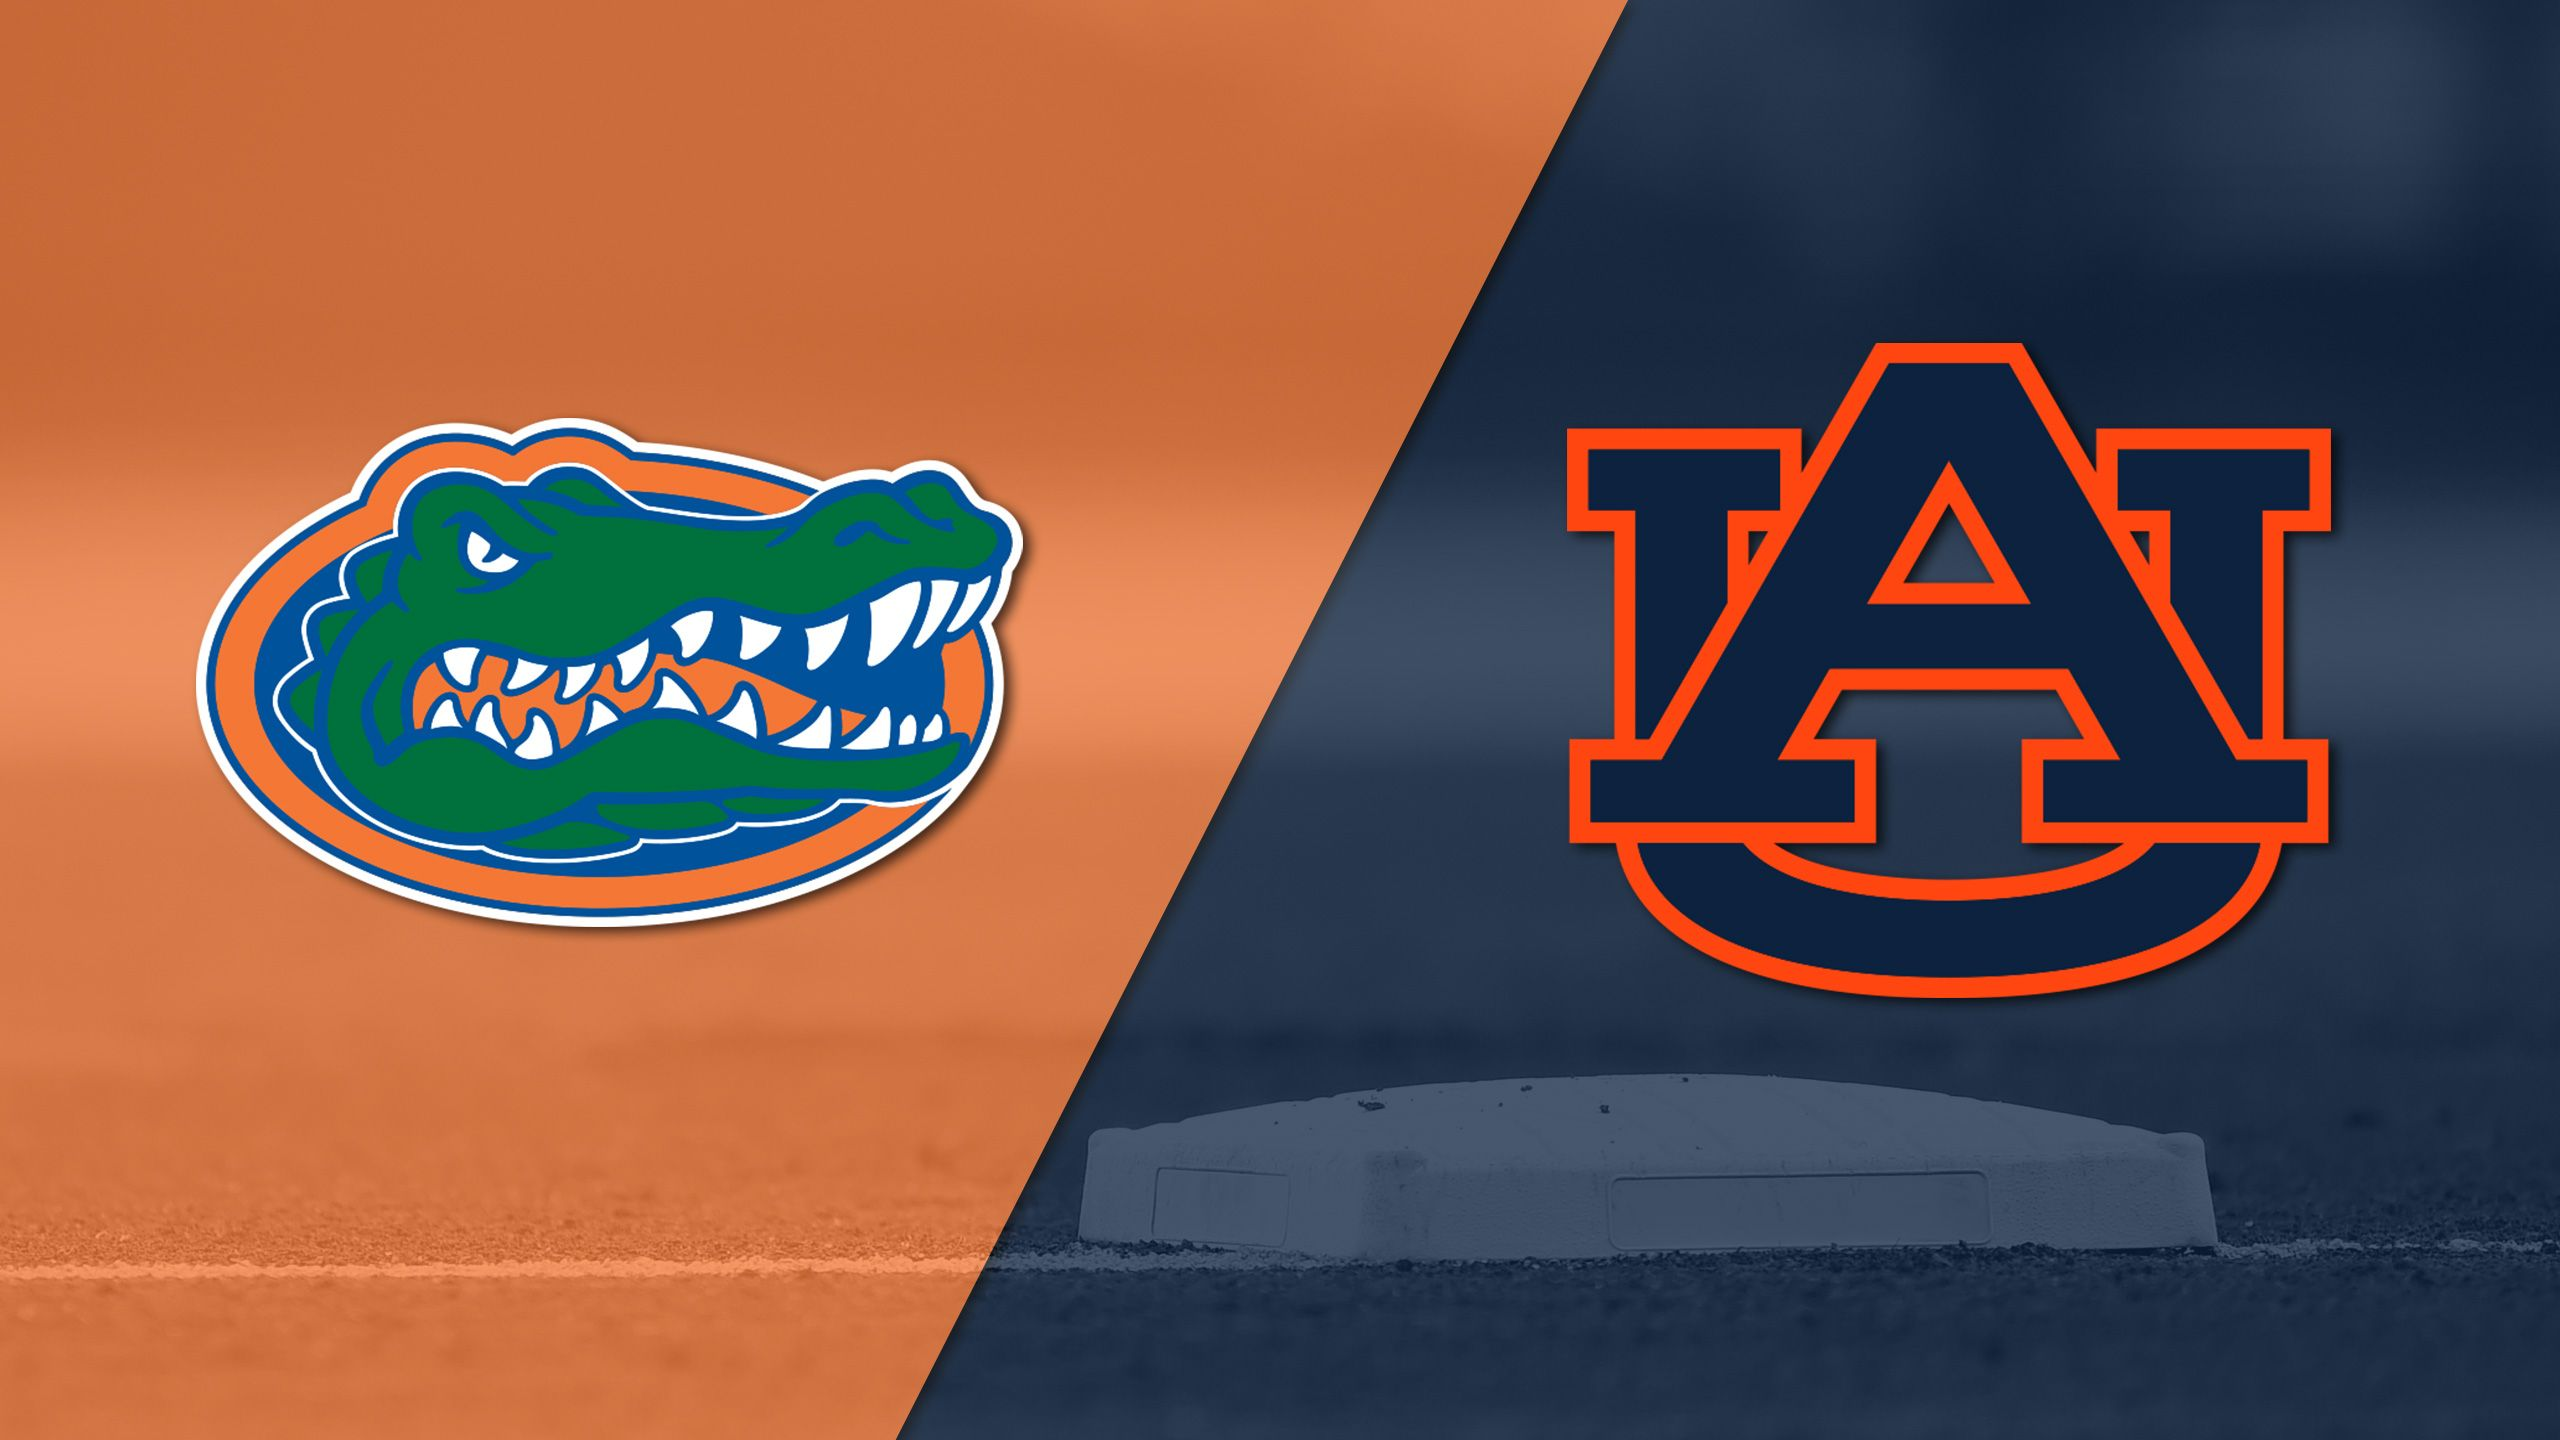 #5 Florida vs. Auburn (Baseball)